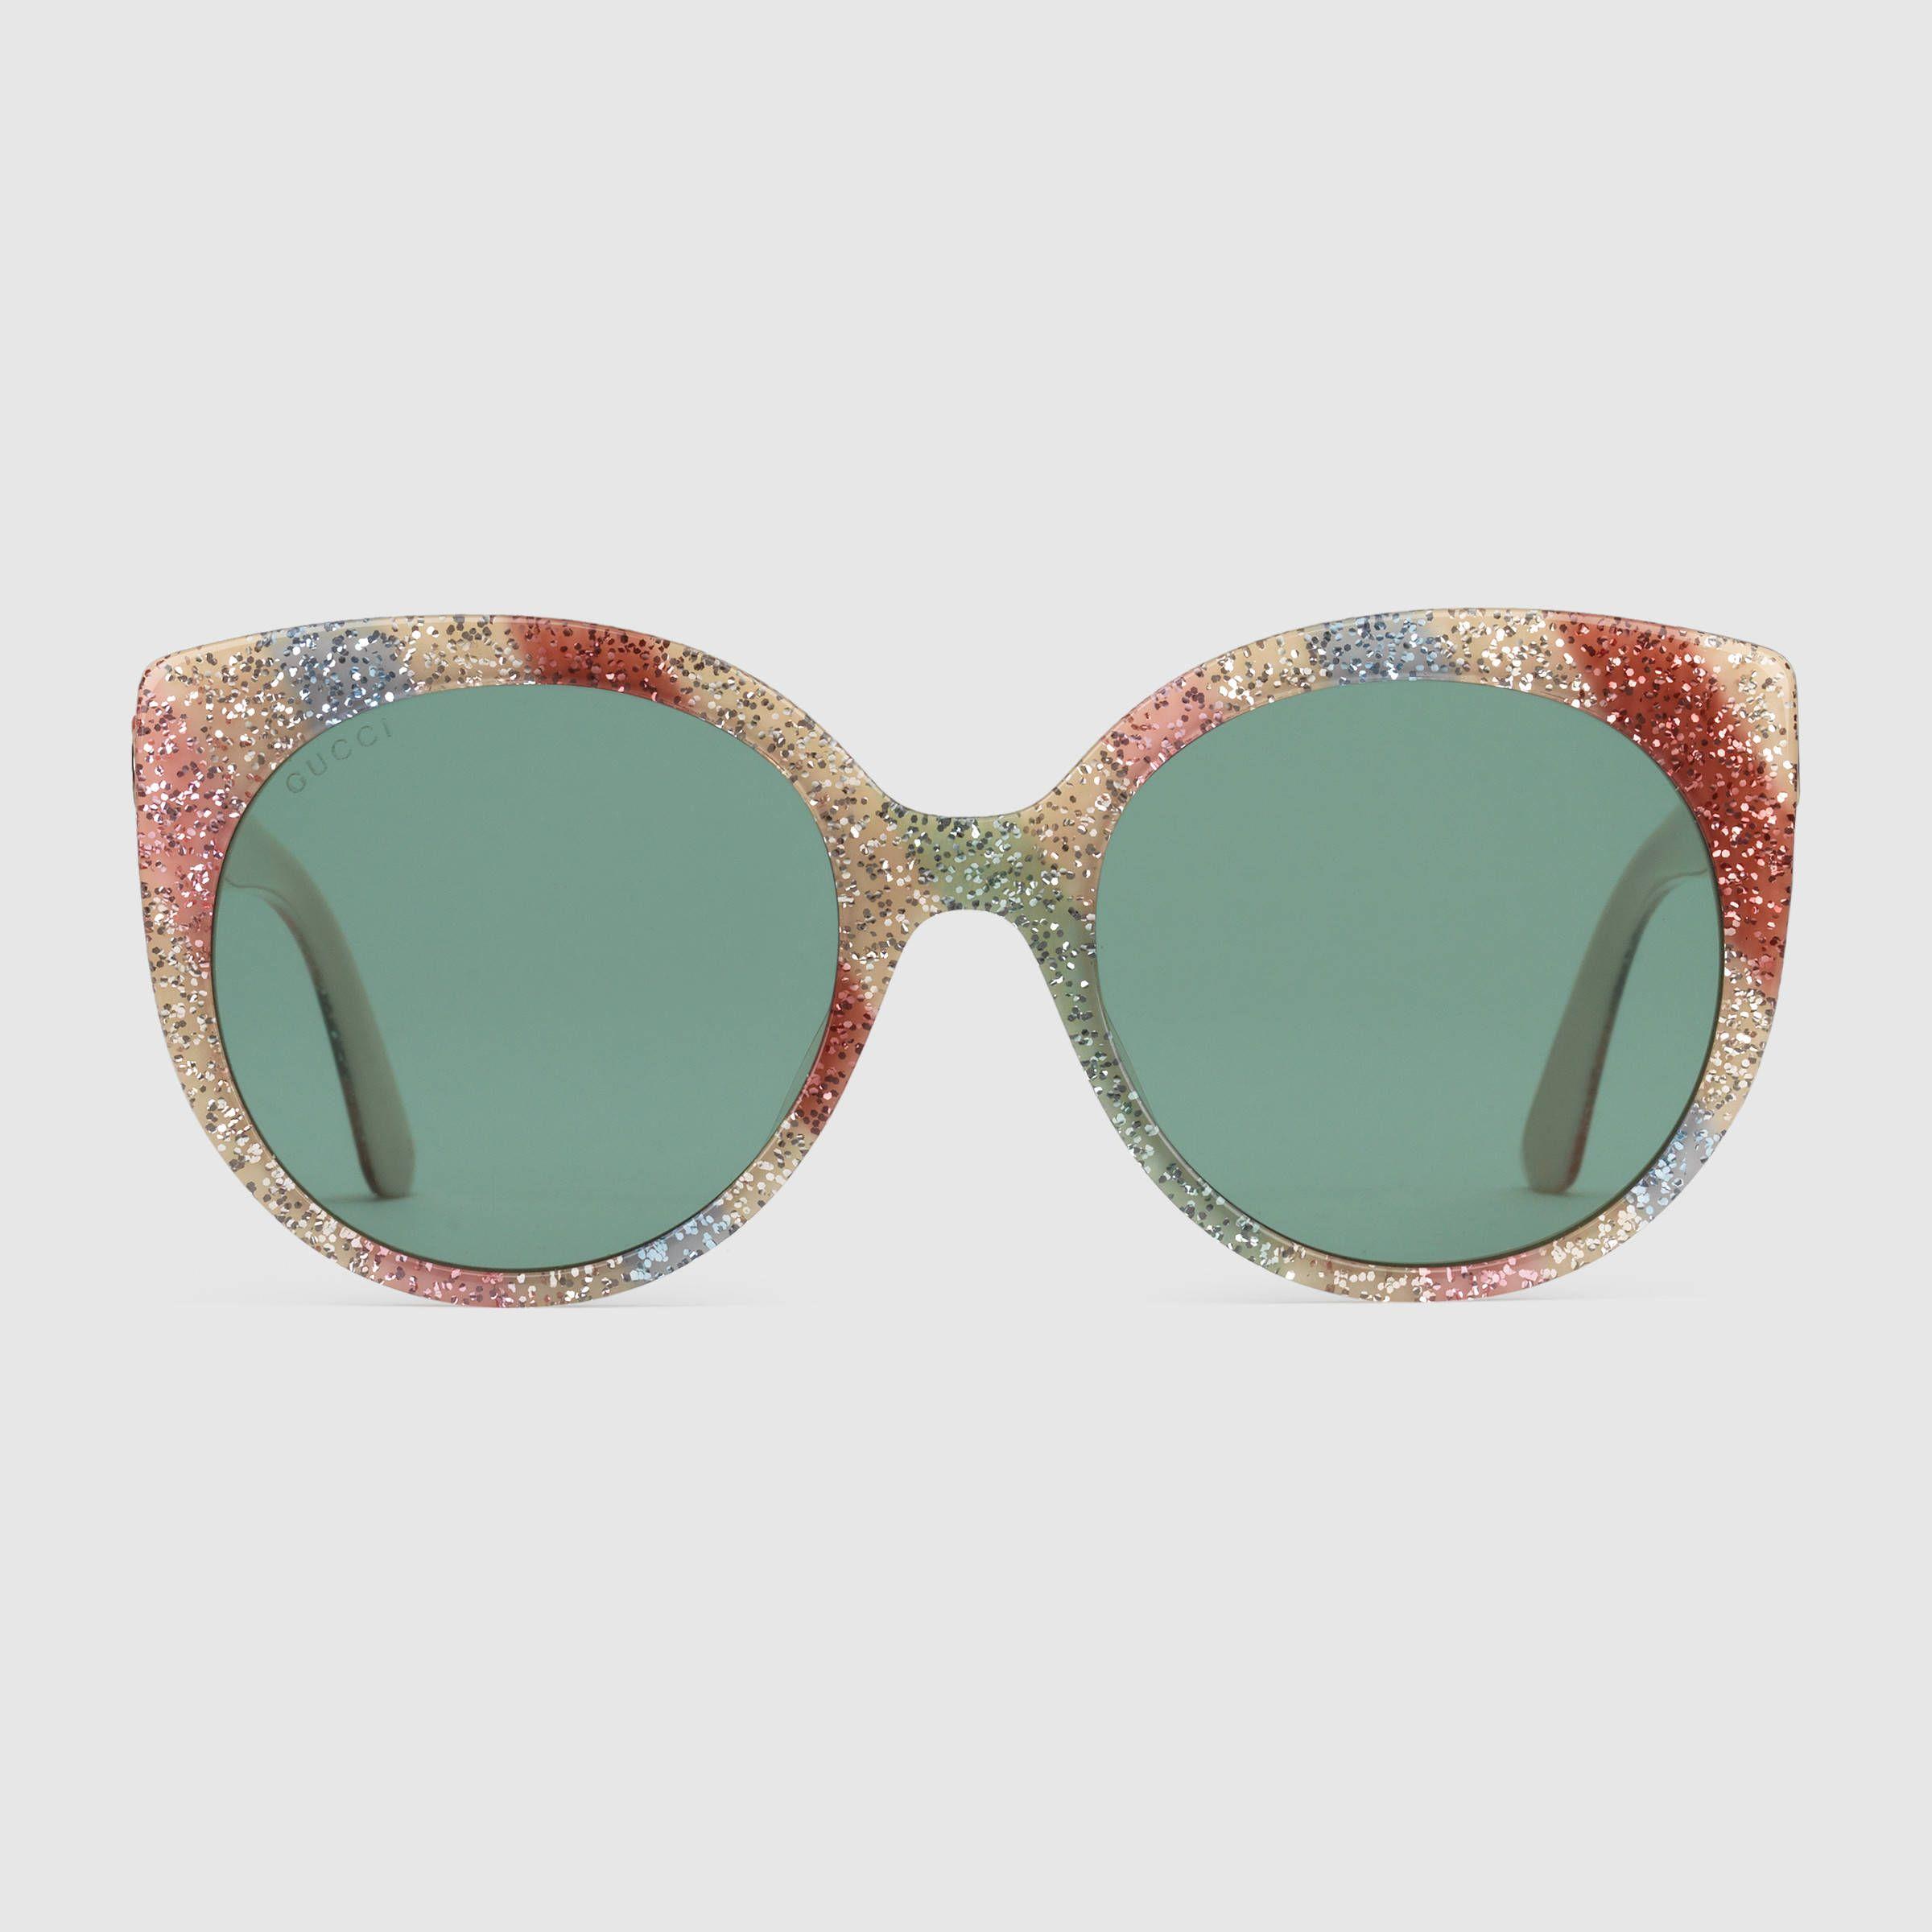 2fbdad3d293 Cat eye glitter acetate sunglasses - Gucci Women s Cat Eye love a good cat  eye  gucci  fashionfun  standinthesun 519164J07408999